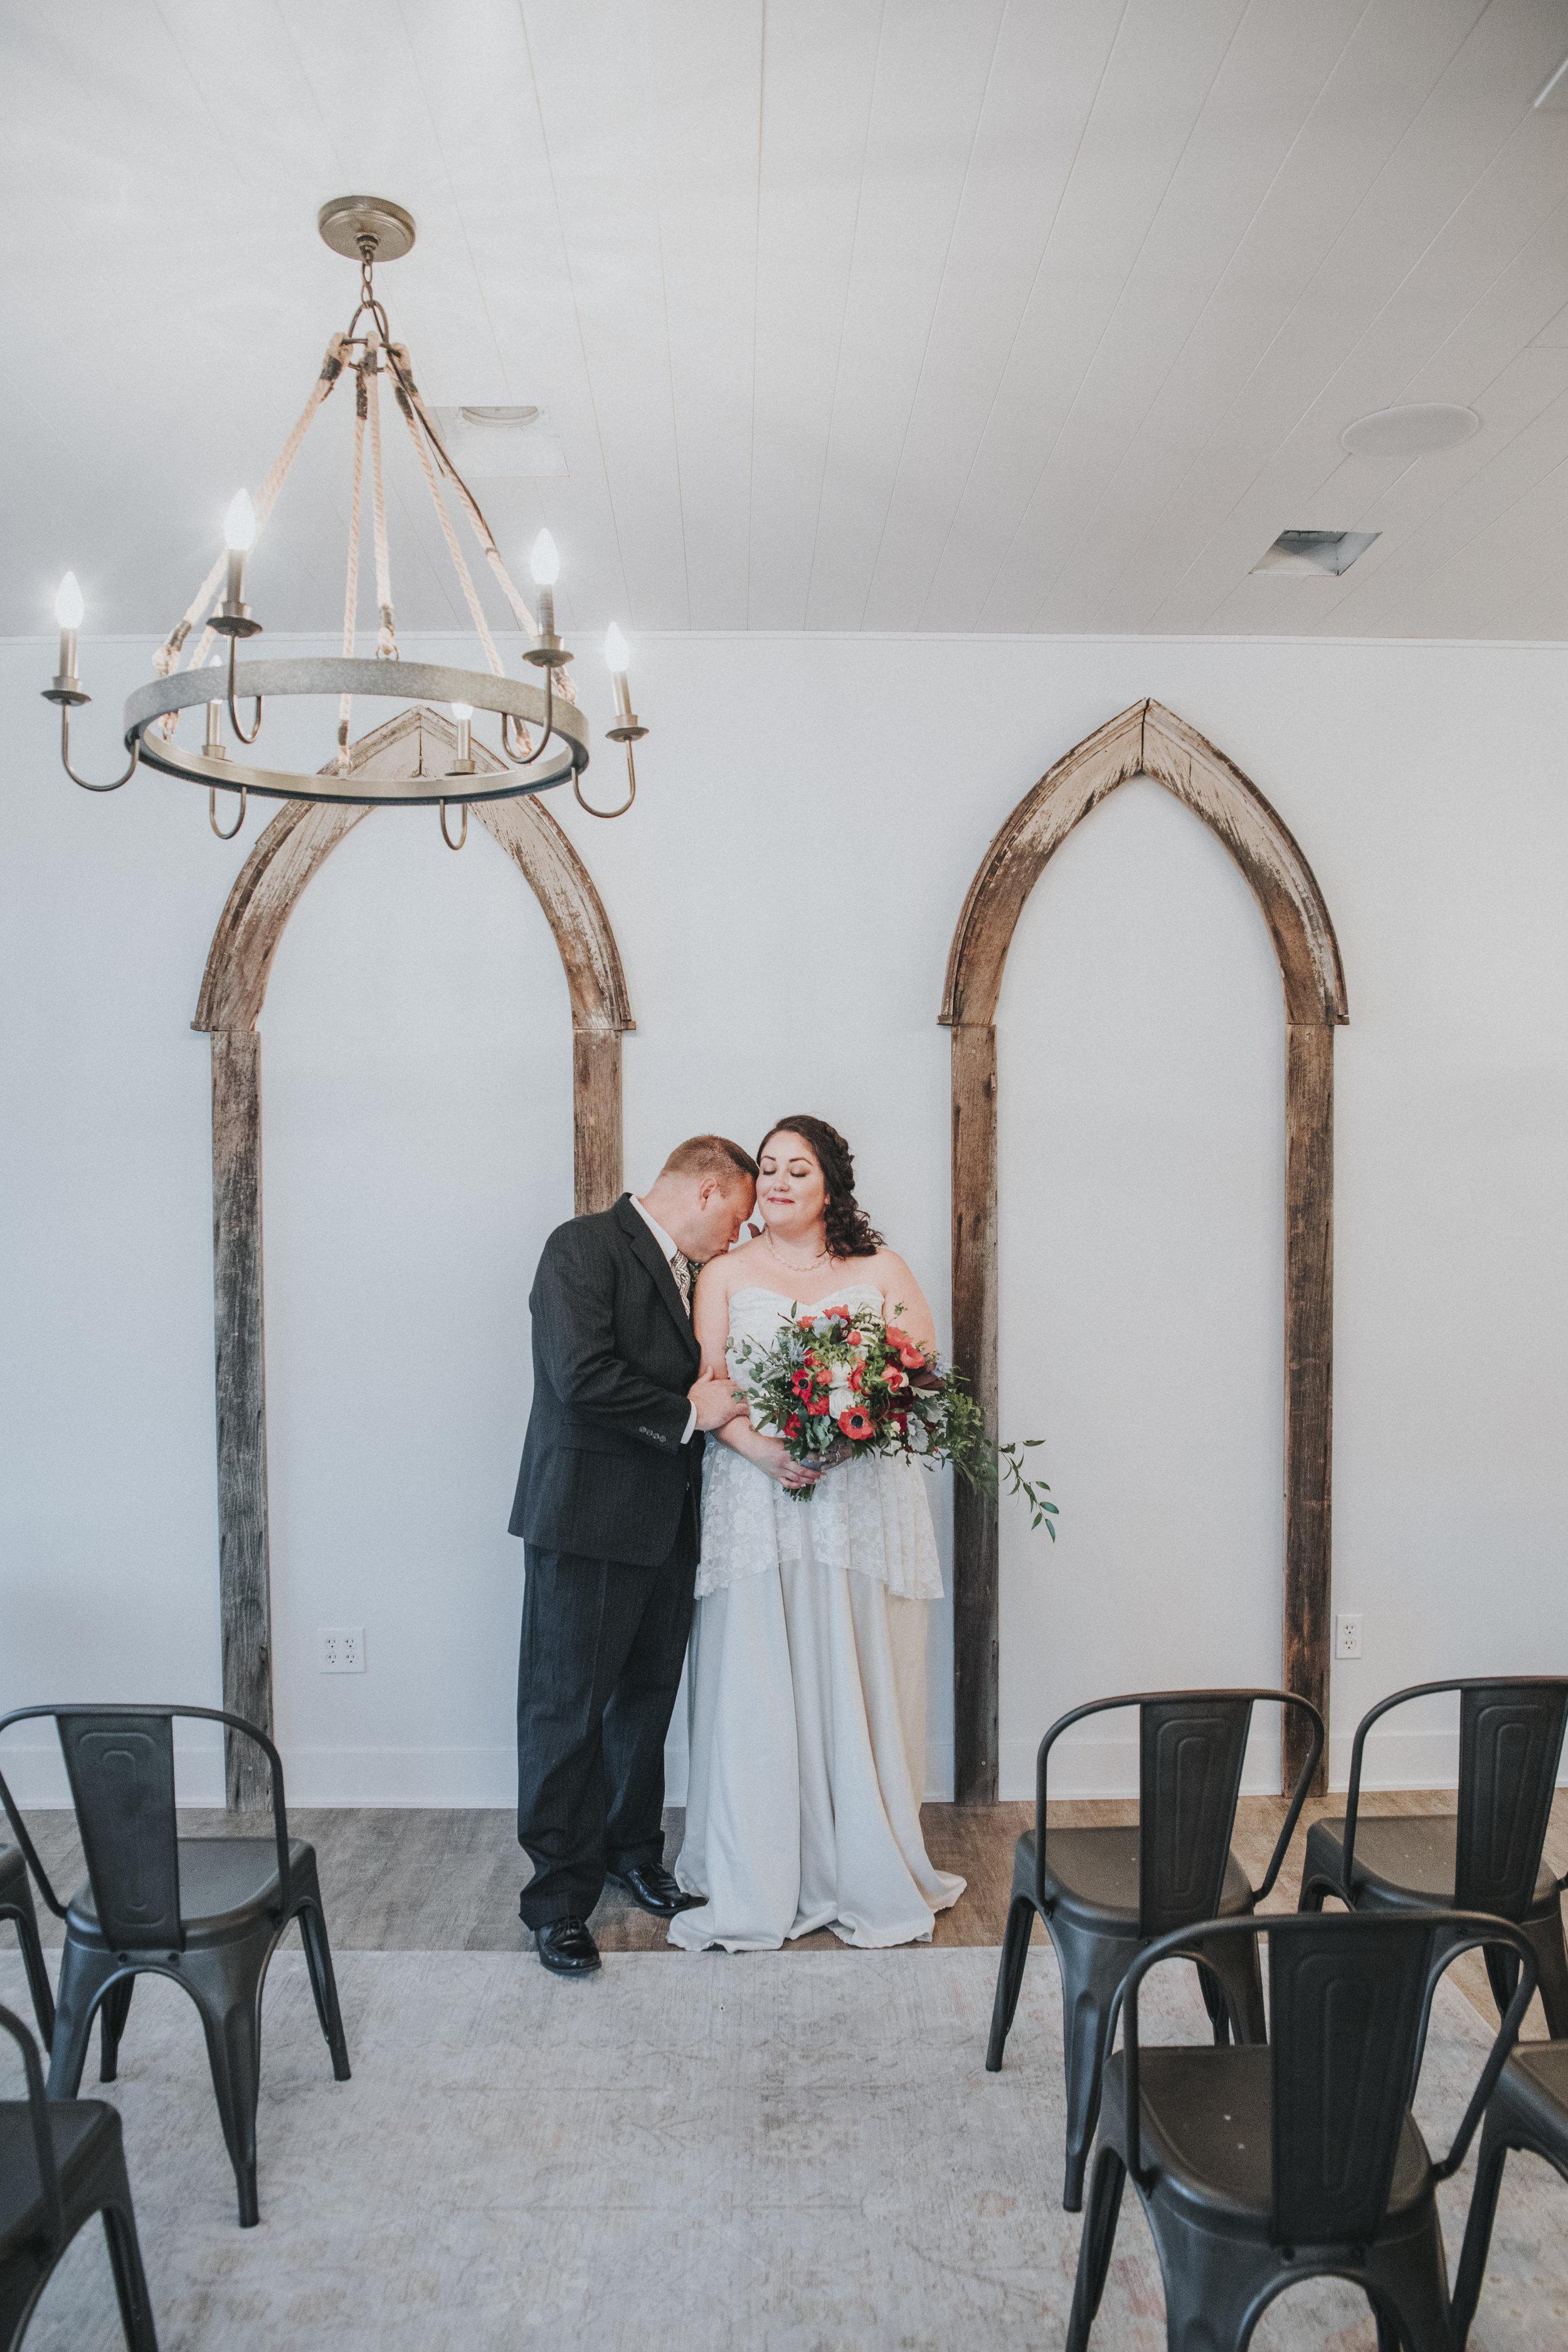 102 midwest-colorado-nebraska-elopement-photography-gretna-turtledoves.jpg